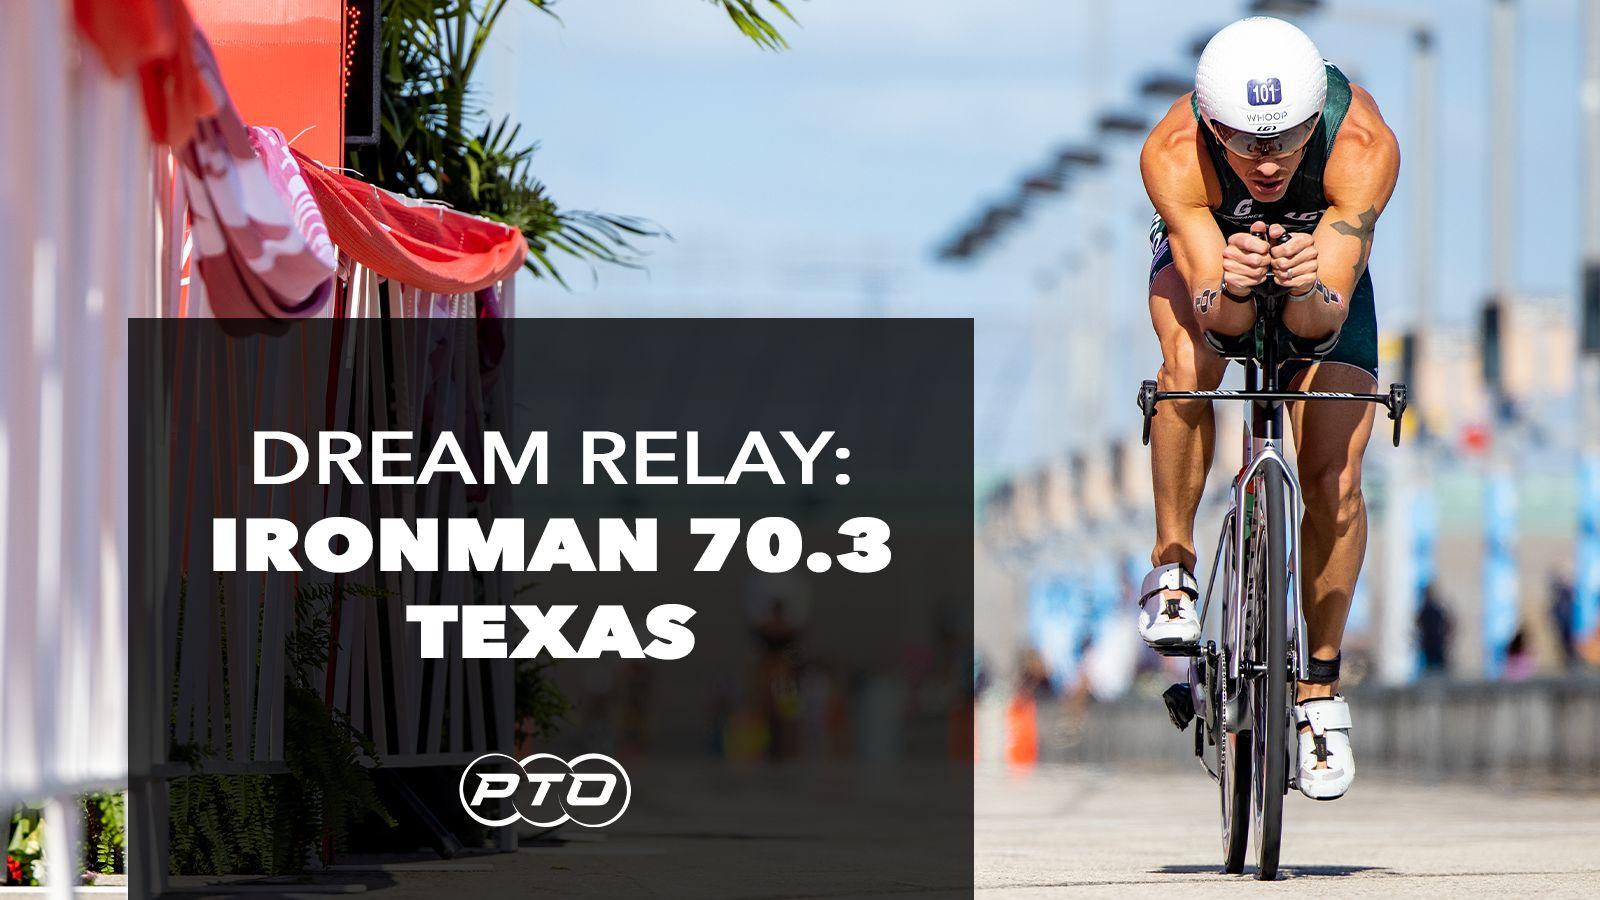 Dream Relay: Ironman 70.3 Texas